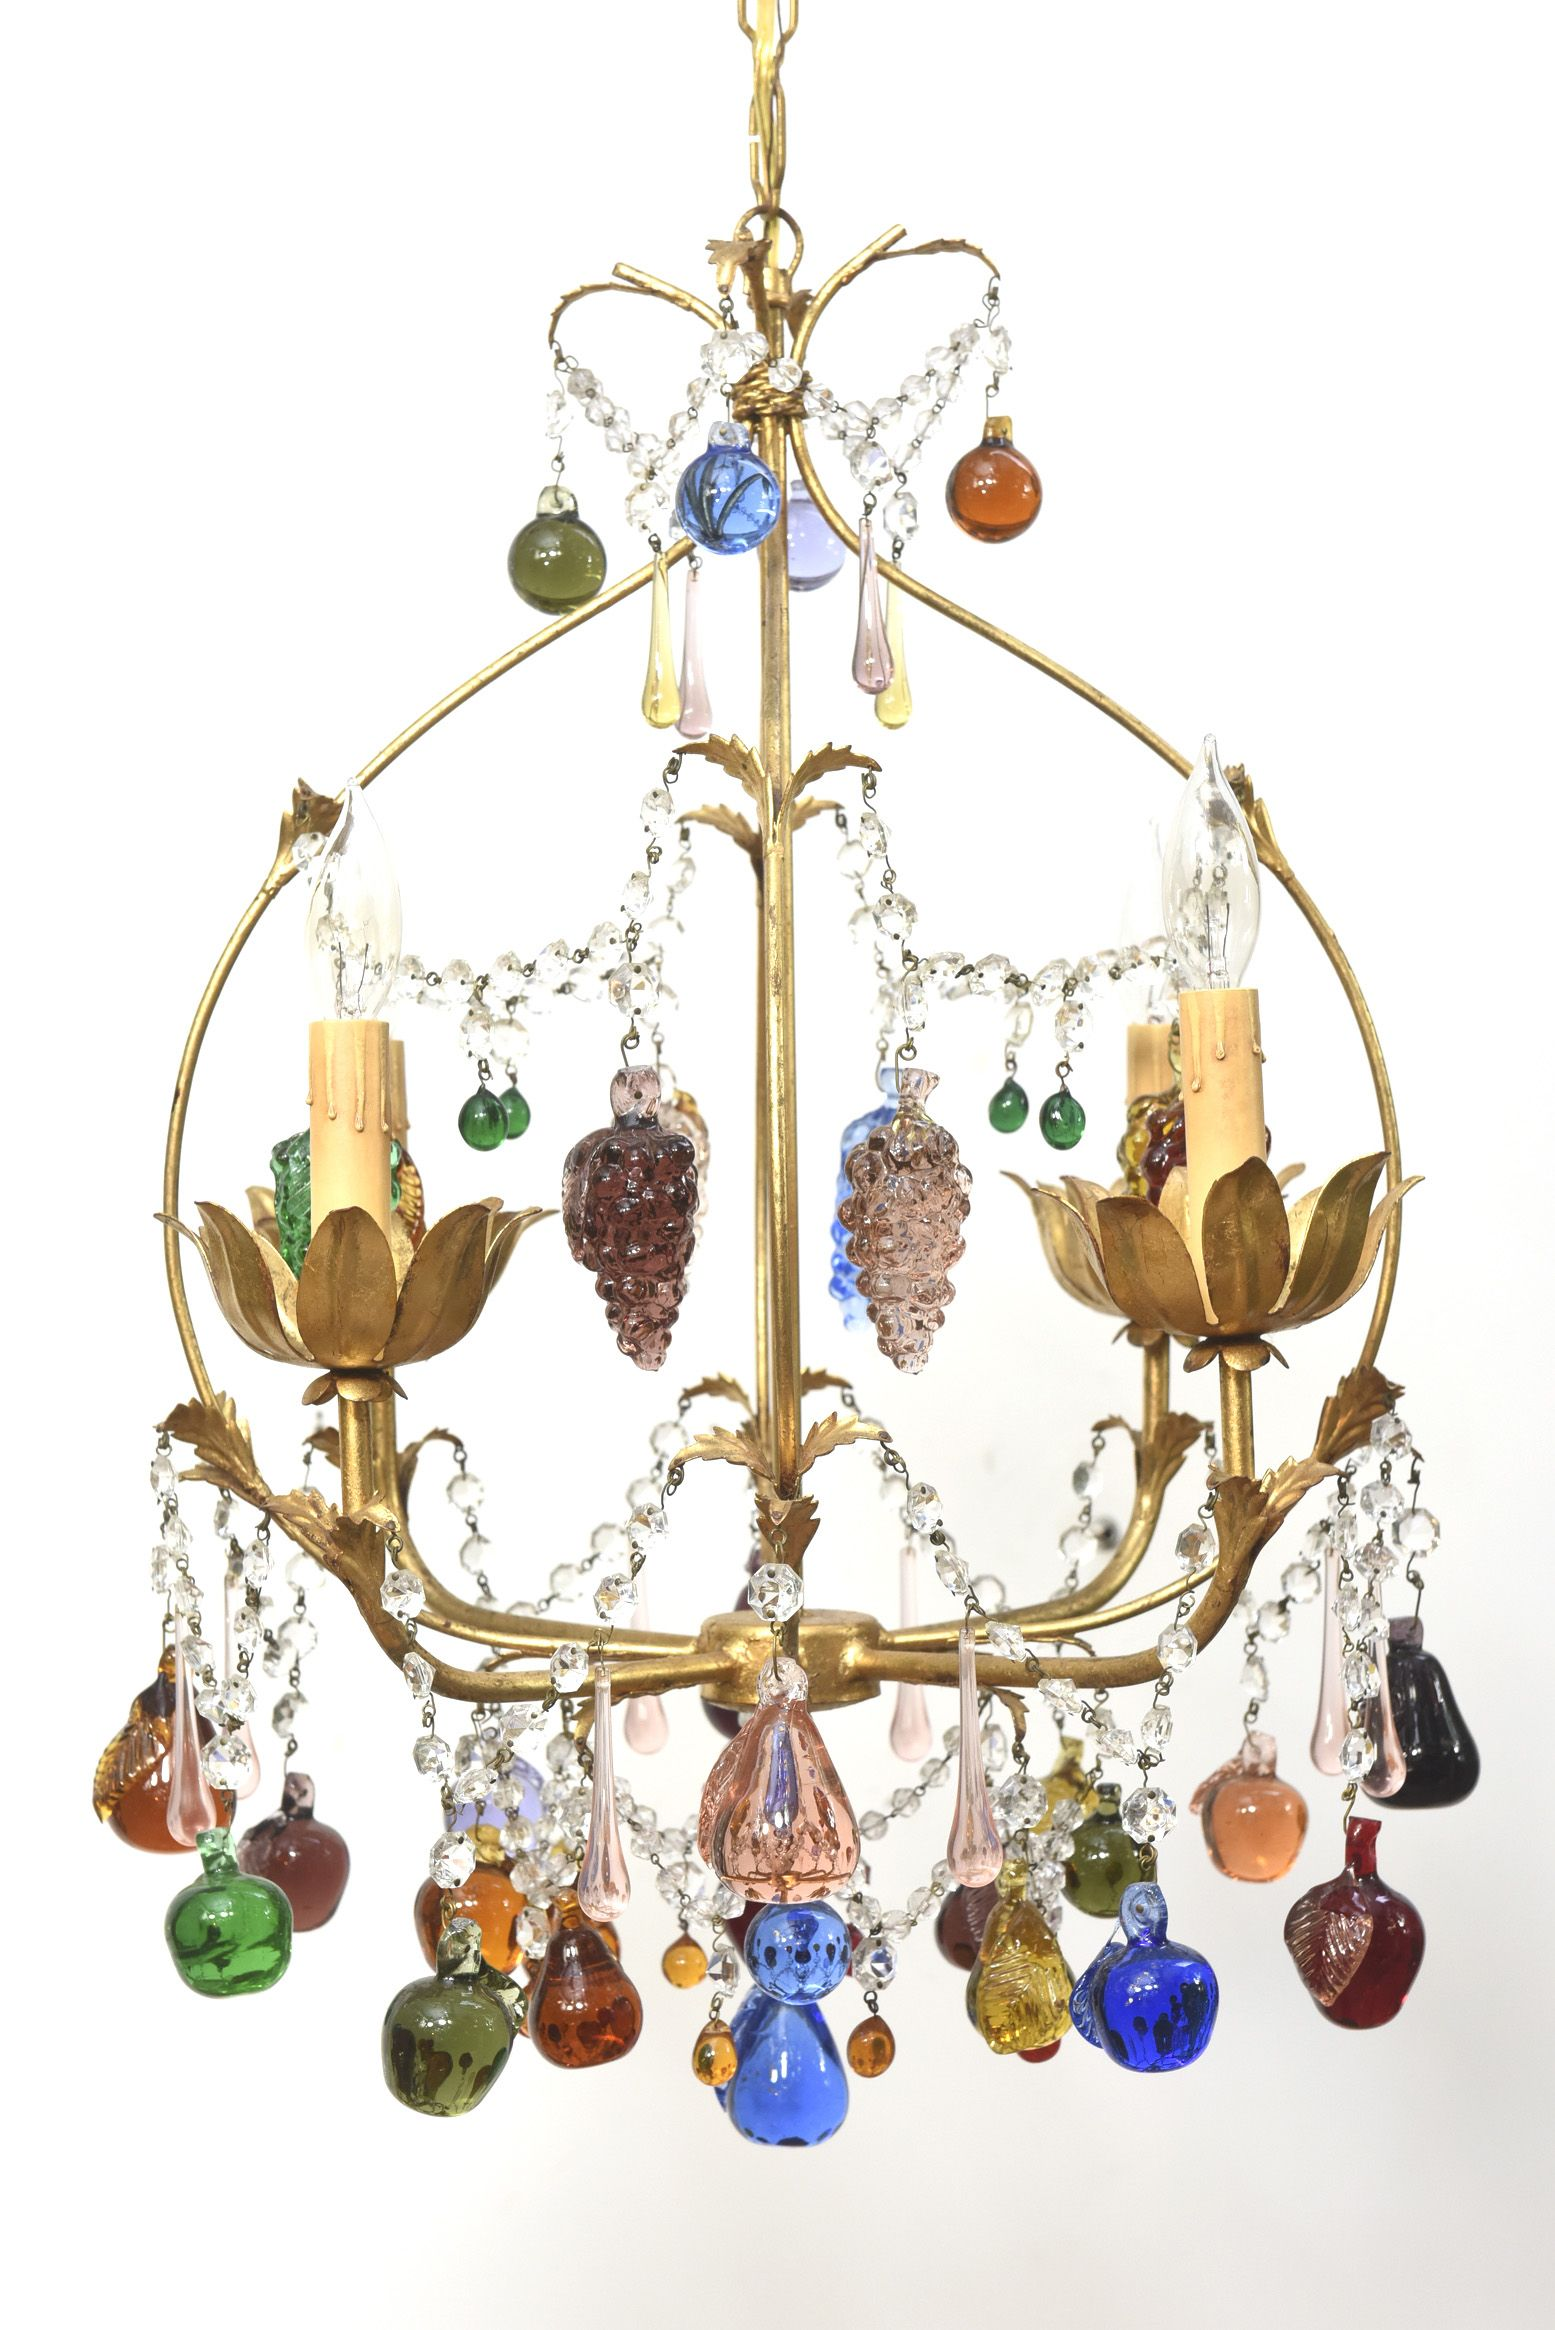 Vintage Italian Chandelier With Hanging